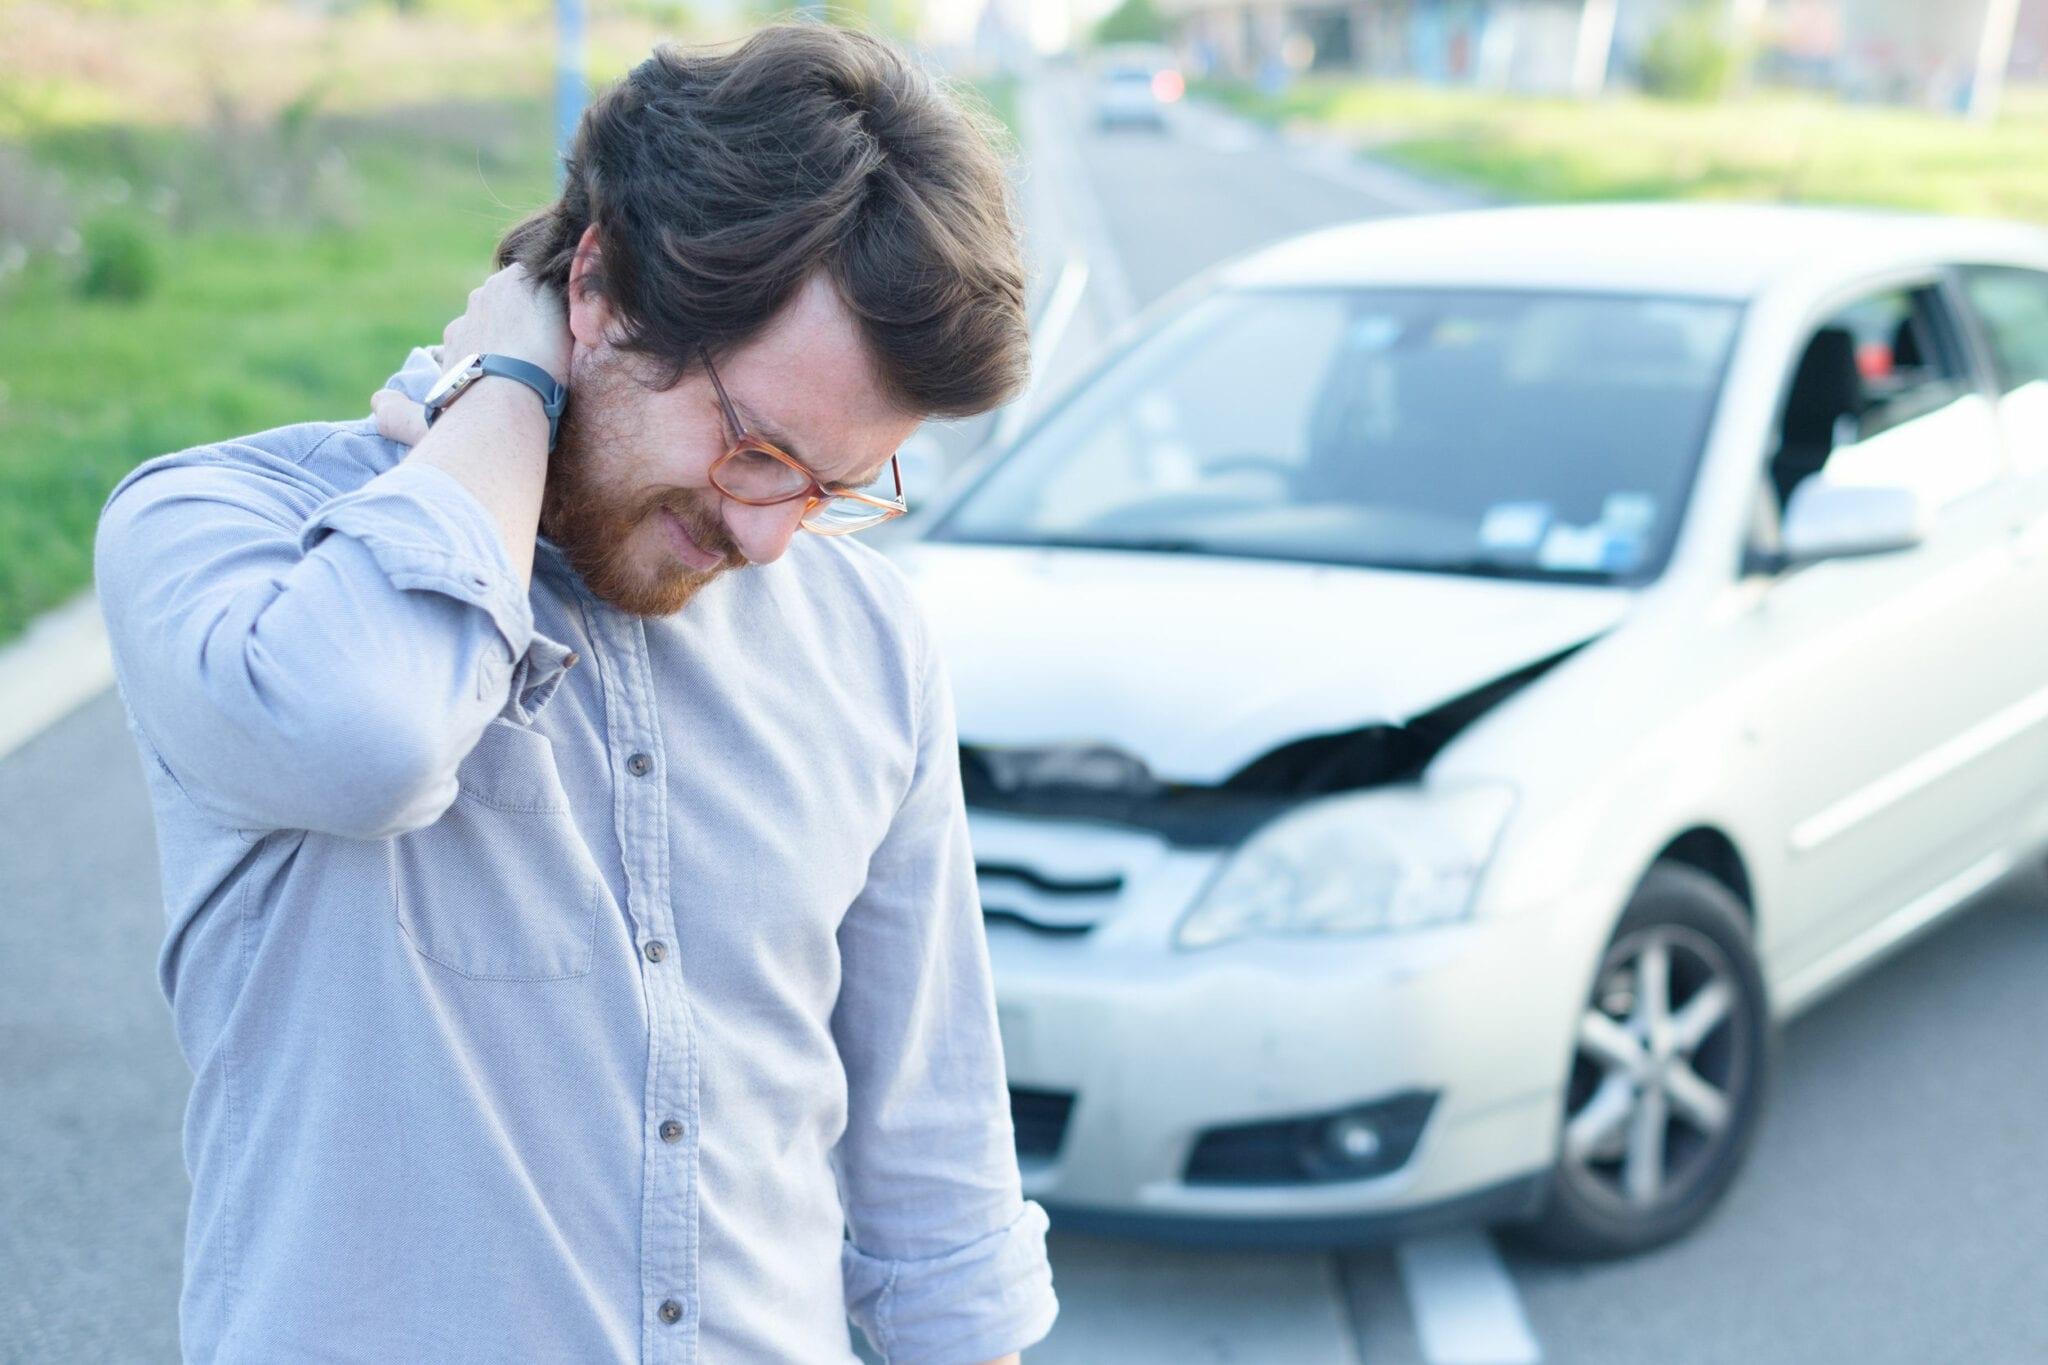 Fort Worth Uber & Lyft Rideshare Auto Accidents